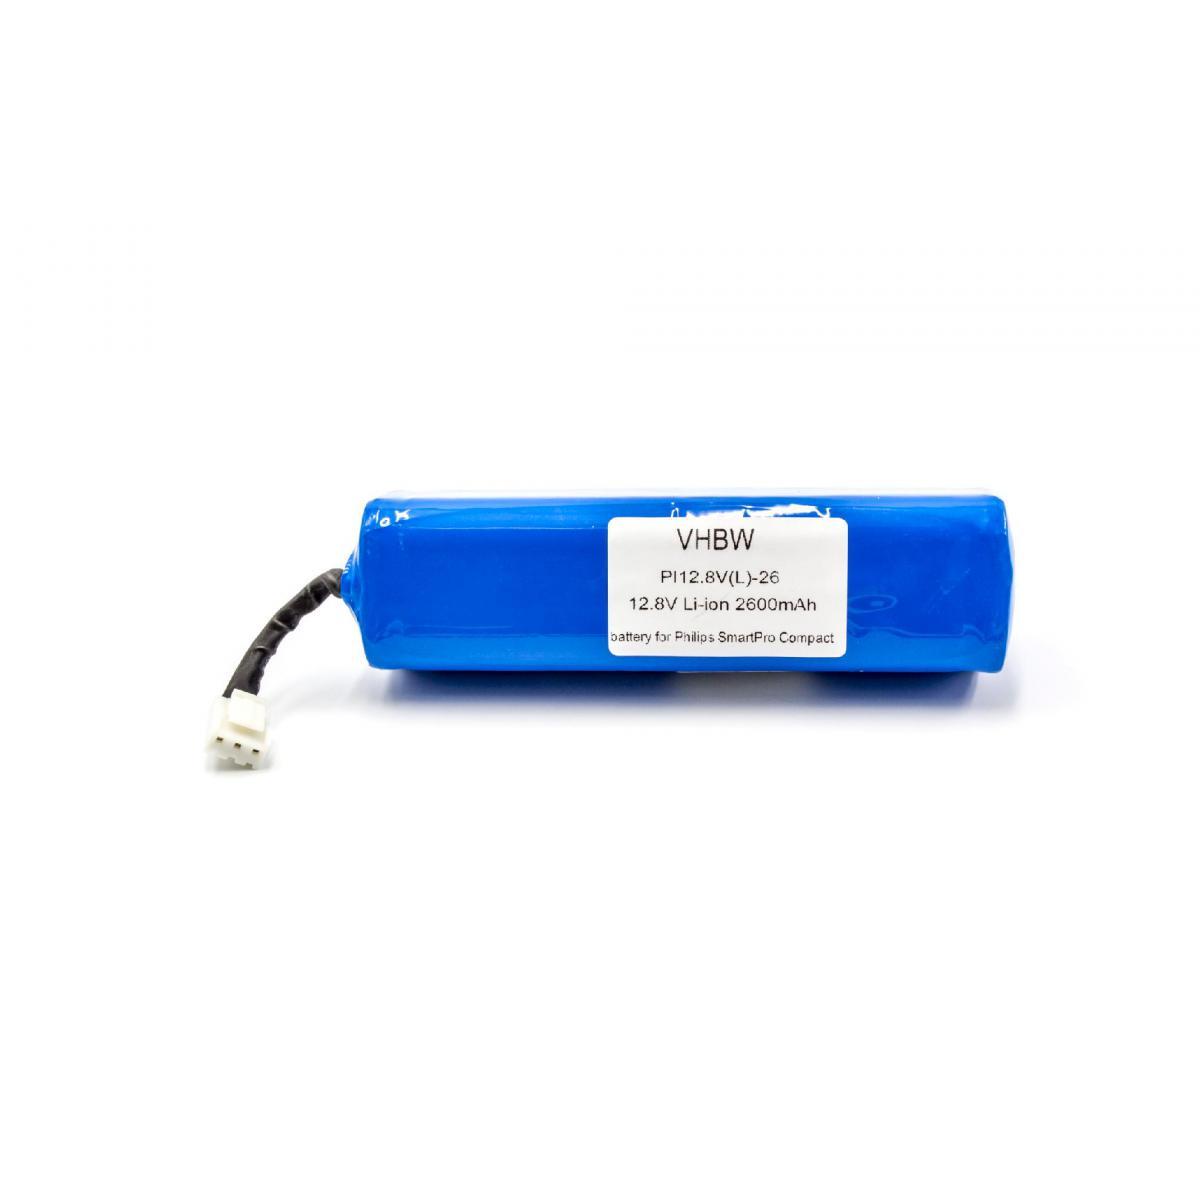 Vhbw vhbw Li-Ion batterie 2600mAh (12.8V) pour Home Cleaner robots domestiques Philips Smartpro Compact FC8710